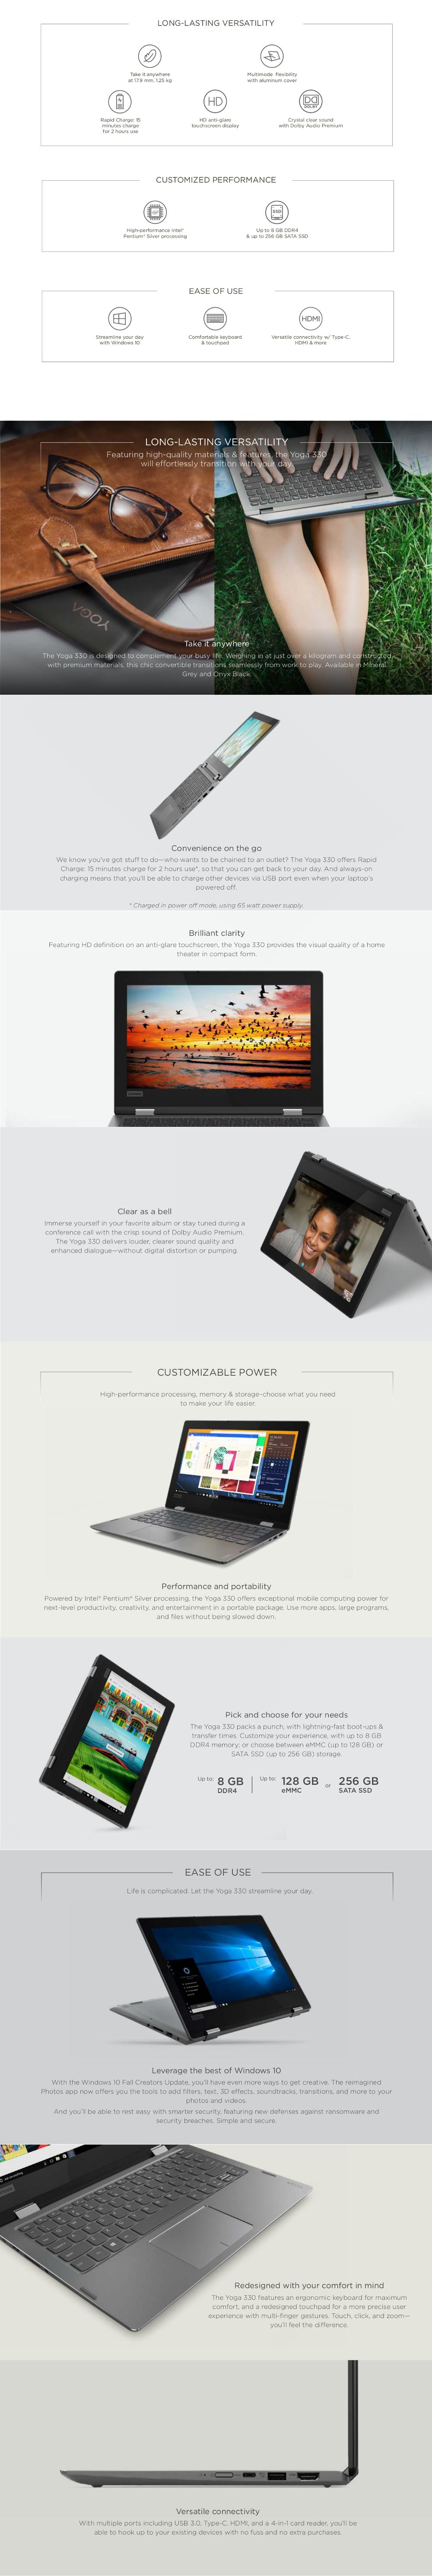 LENOVO YOGA 330-11IGM (81A6002RSB) Pentium/4GB/128GB eMMC [Premium  Refreshed]